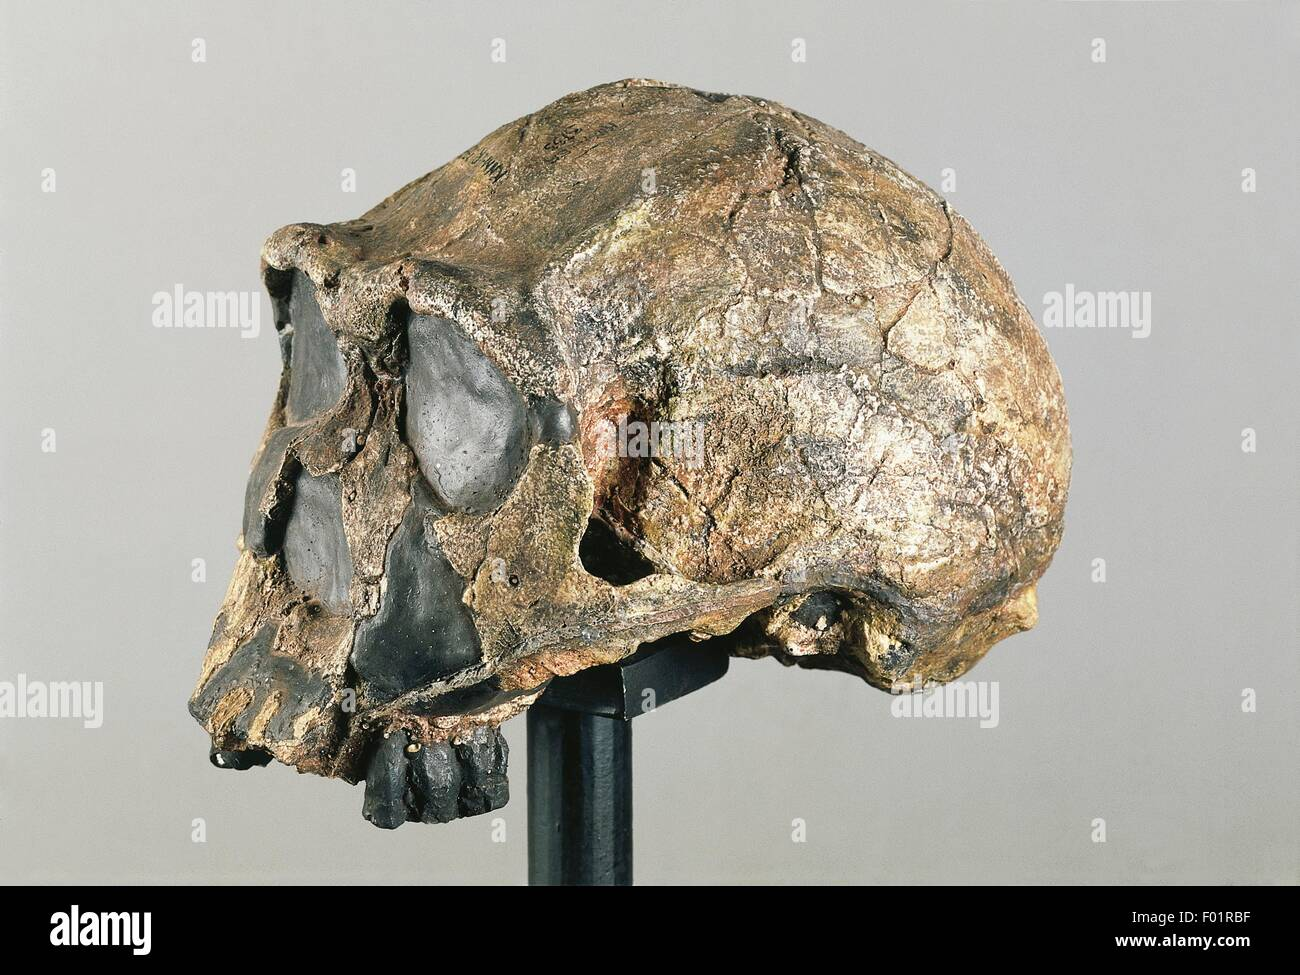 Anthropology - Skull of  Homo Erectus. From Kenya. - Stock Image